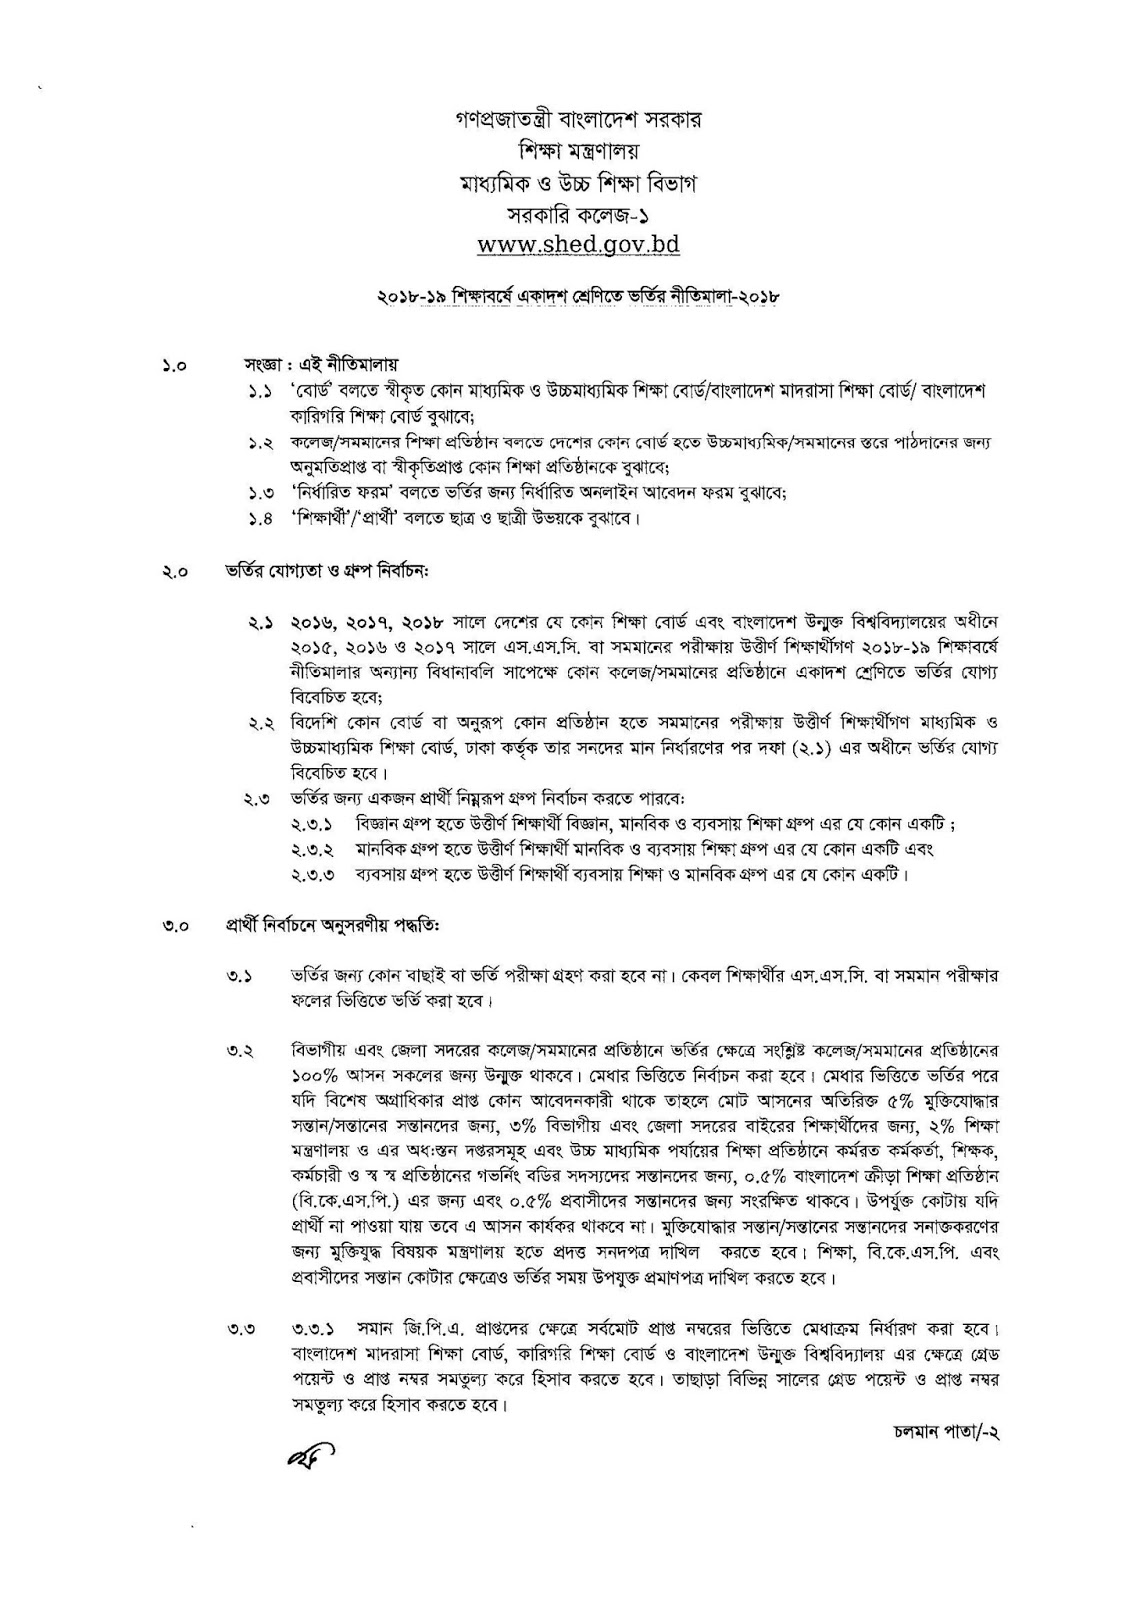 HSC Admission Circular 2018-19